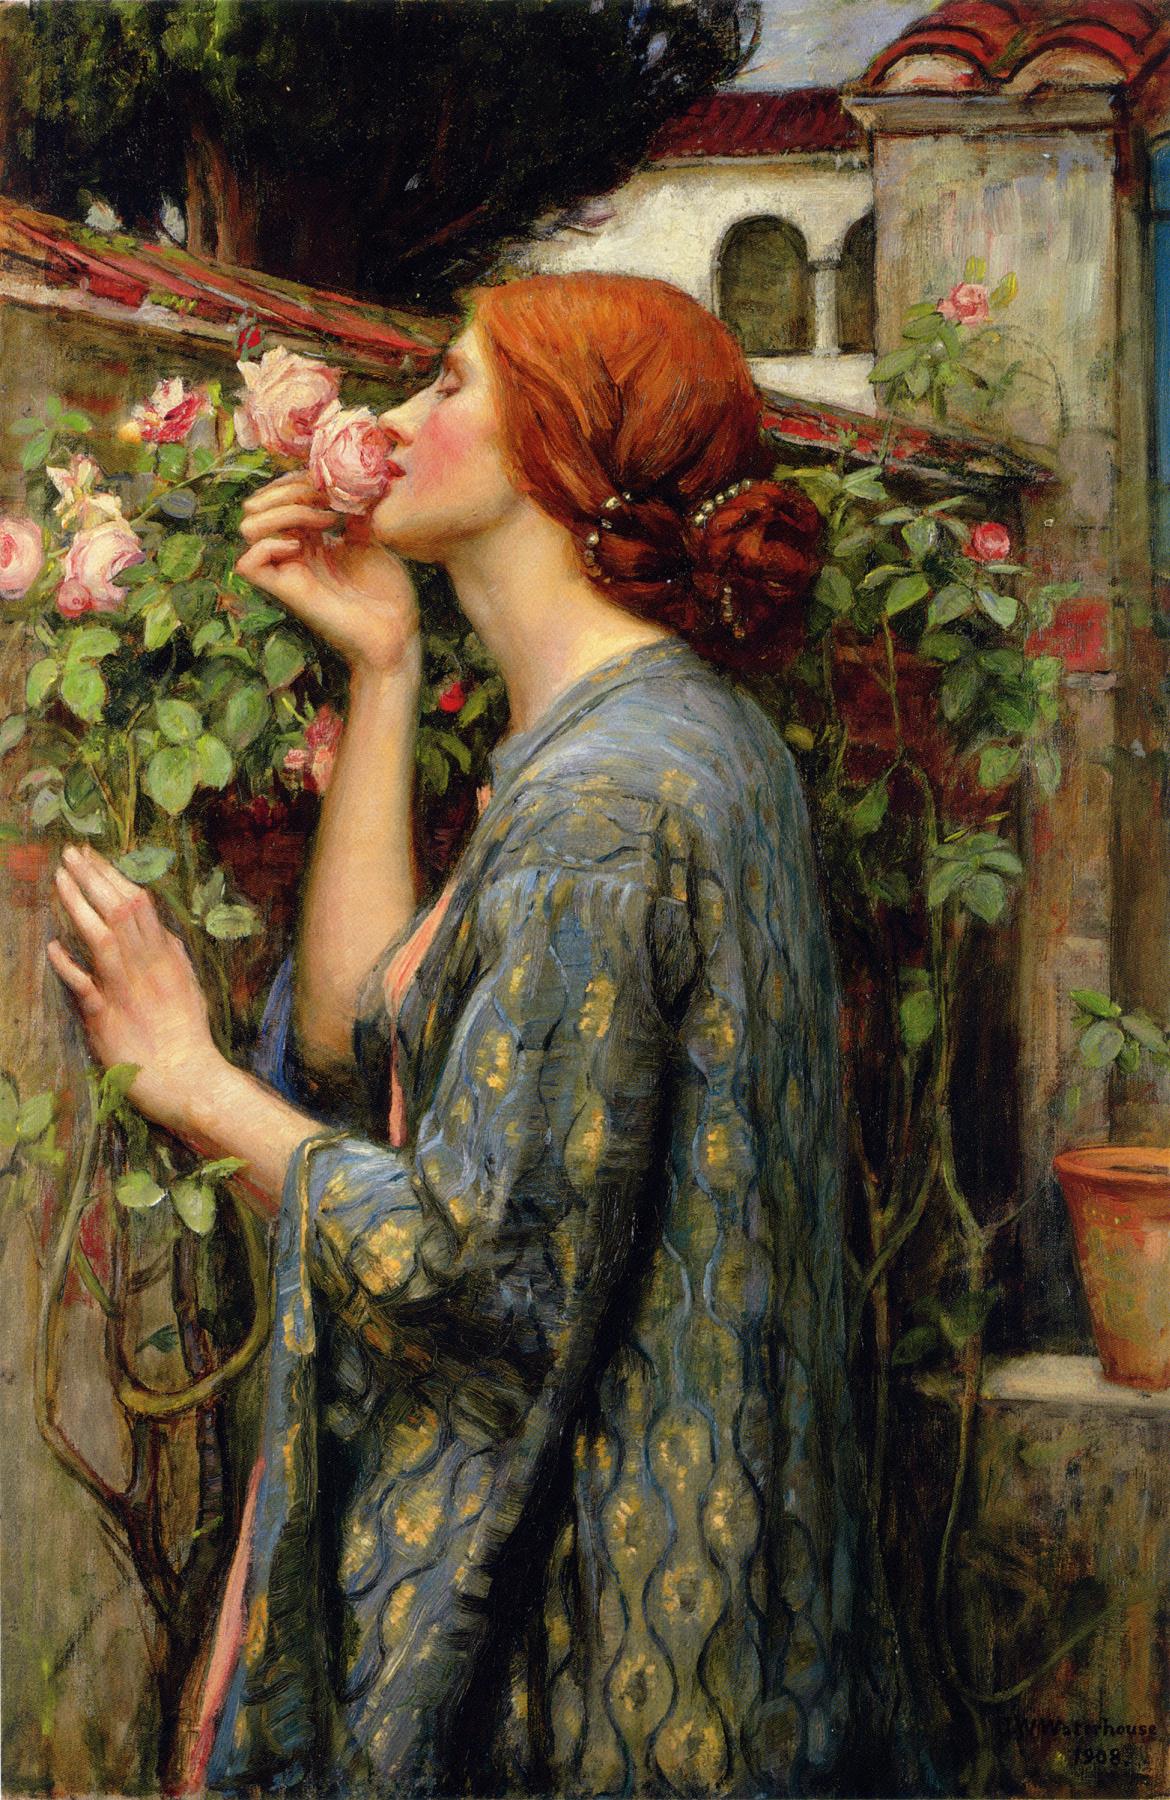 John William Waterhouse. My sweet rose (Soul of rose)